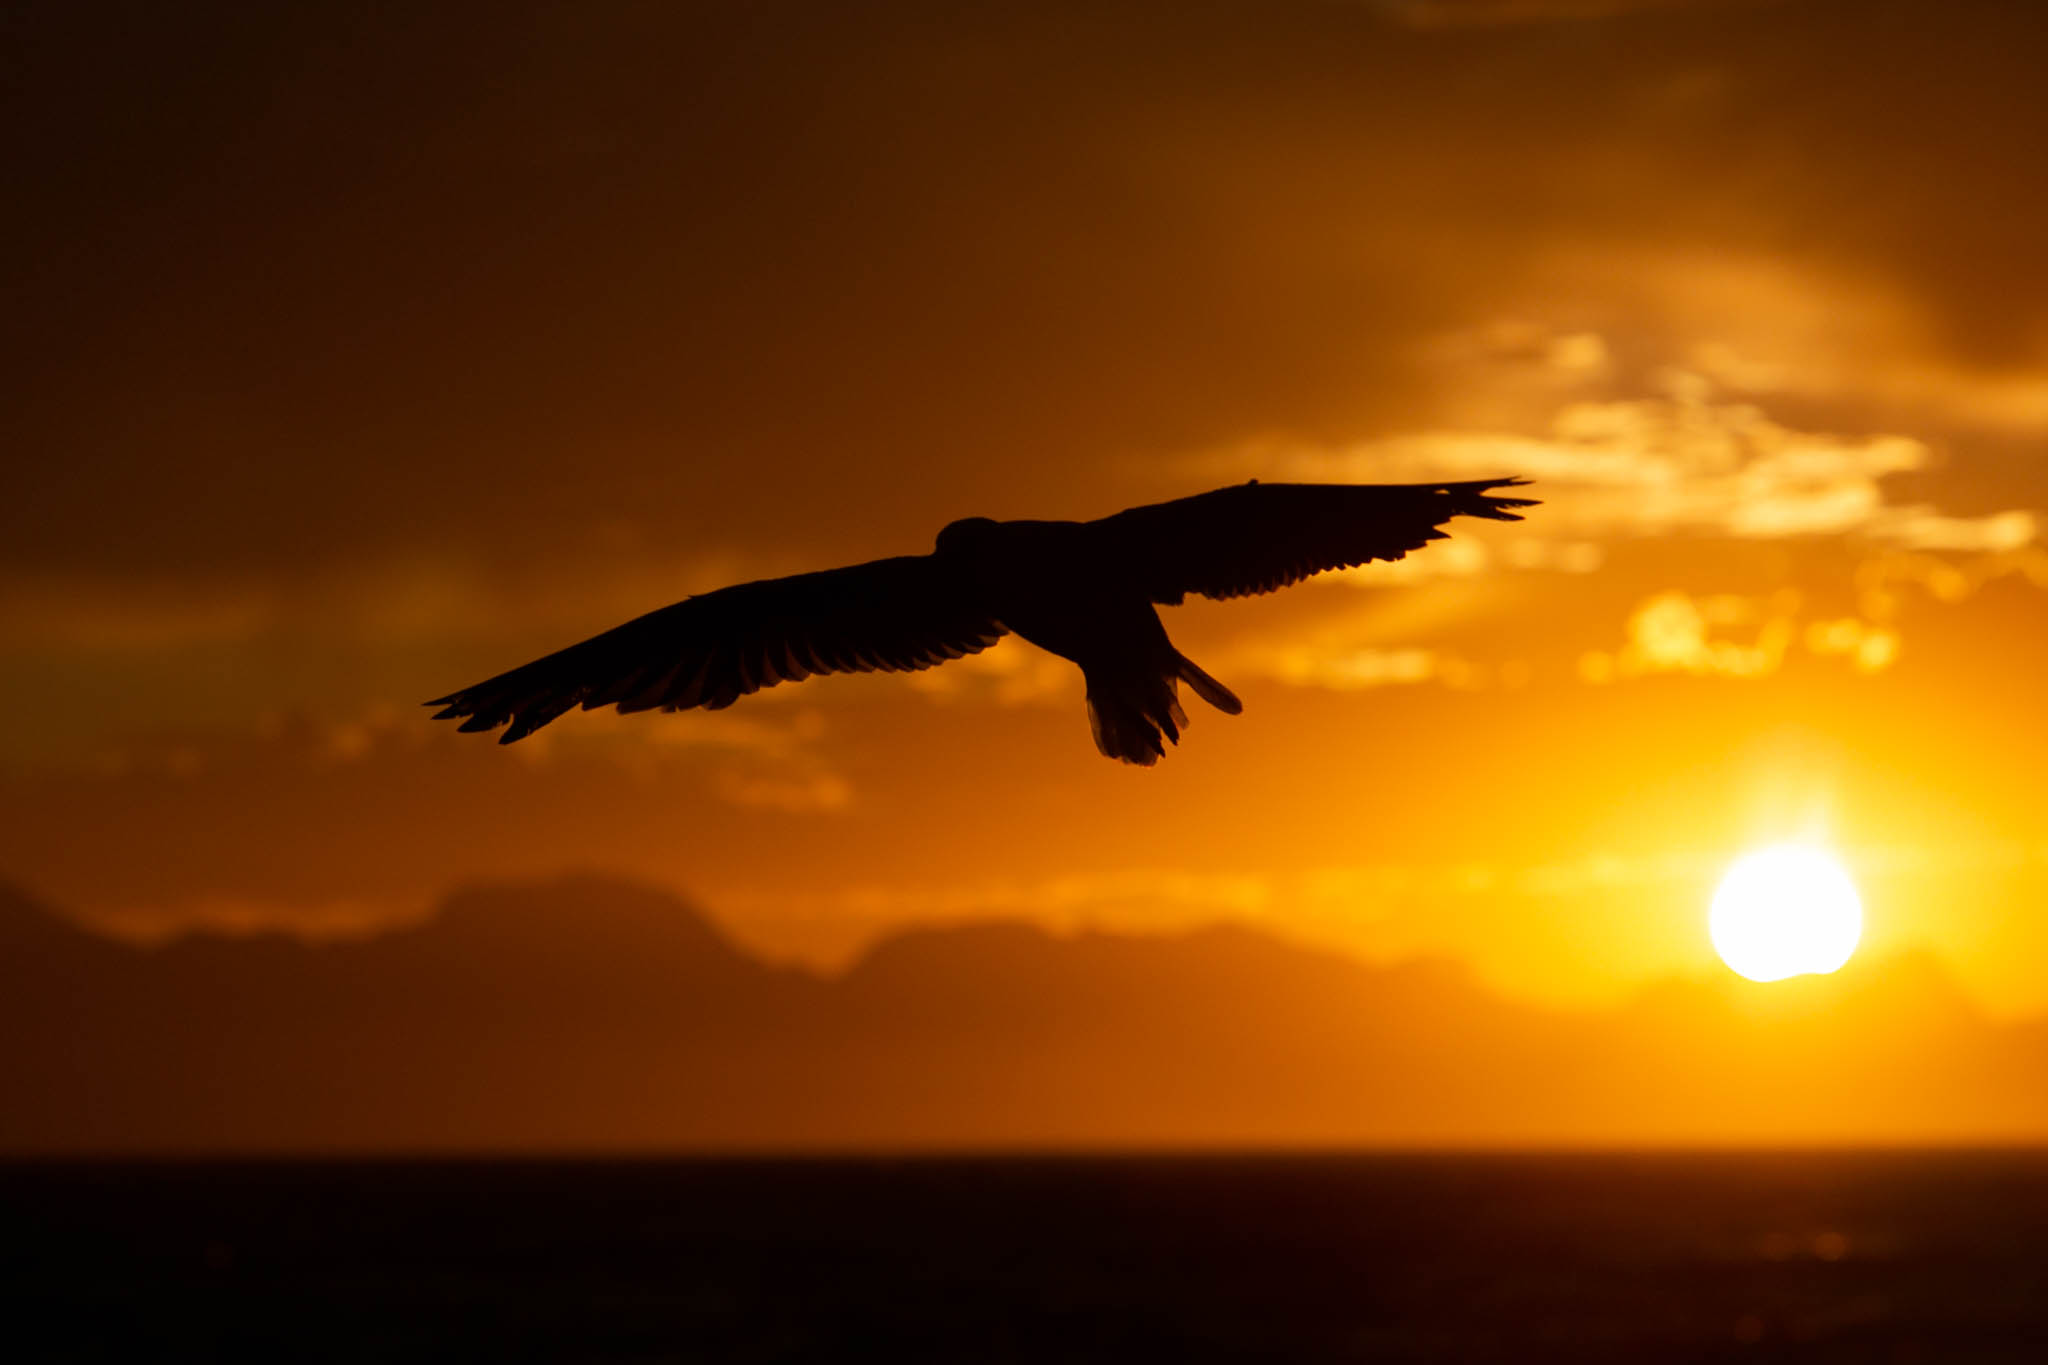 seagul in silhouette at sunrise